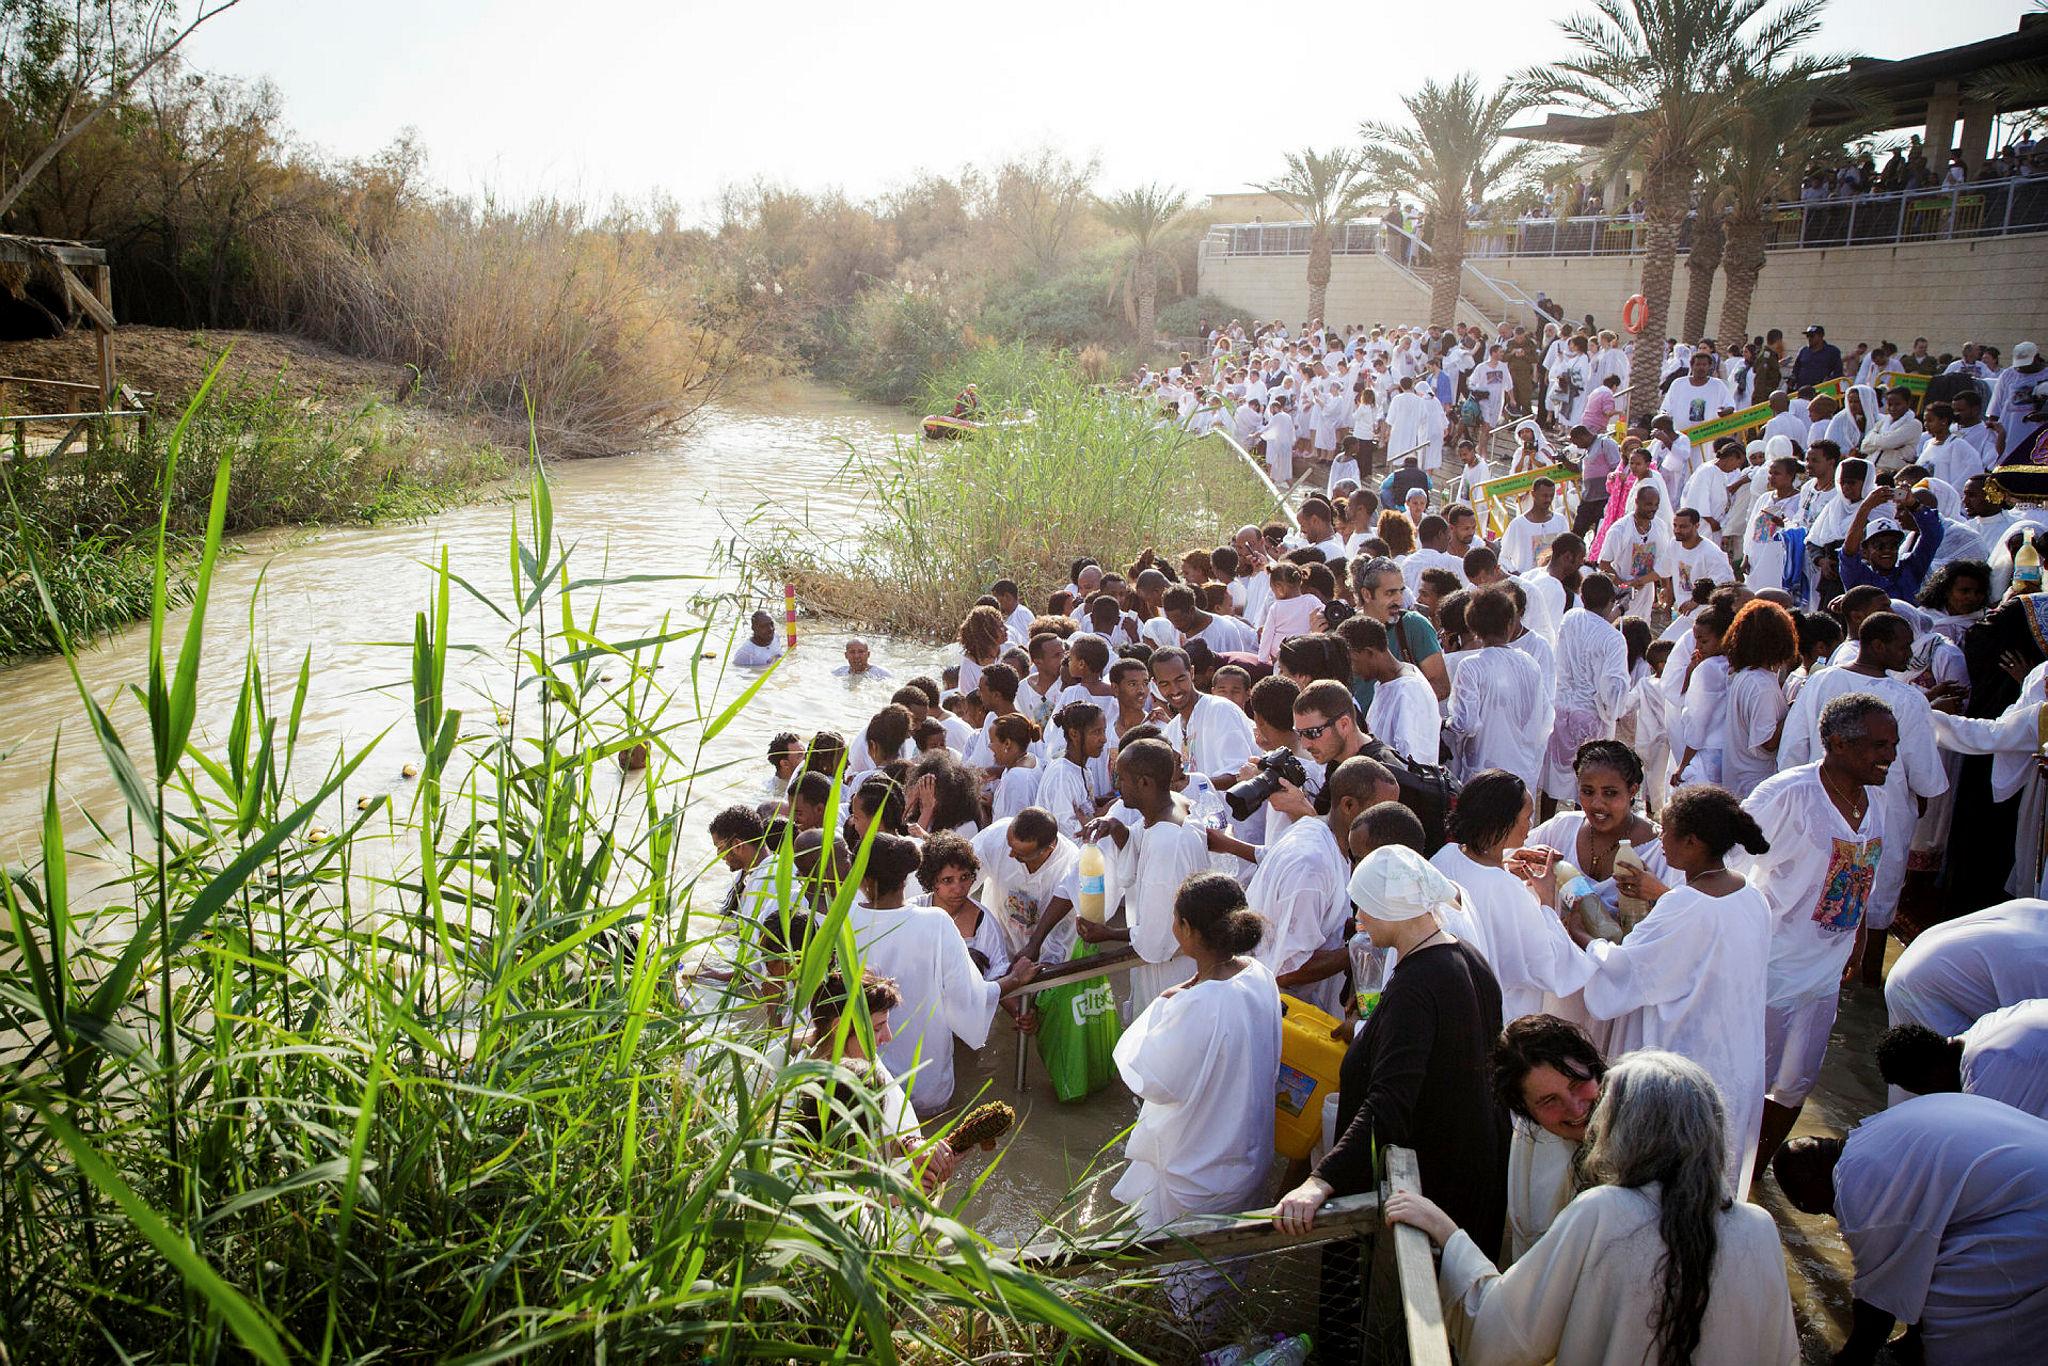 Orthodox Christian pilgrims in Qasr el Yahud